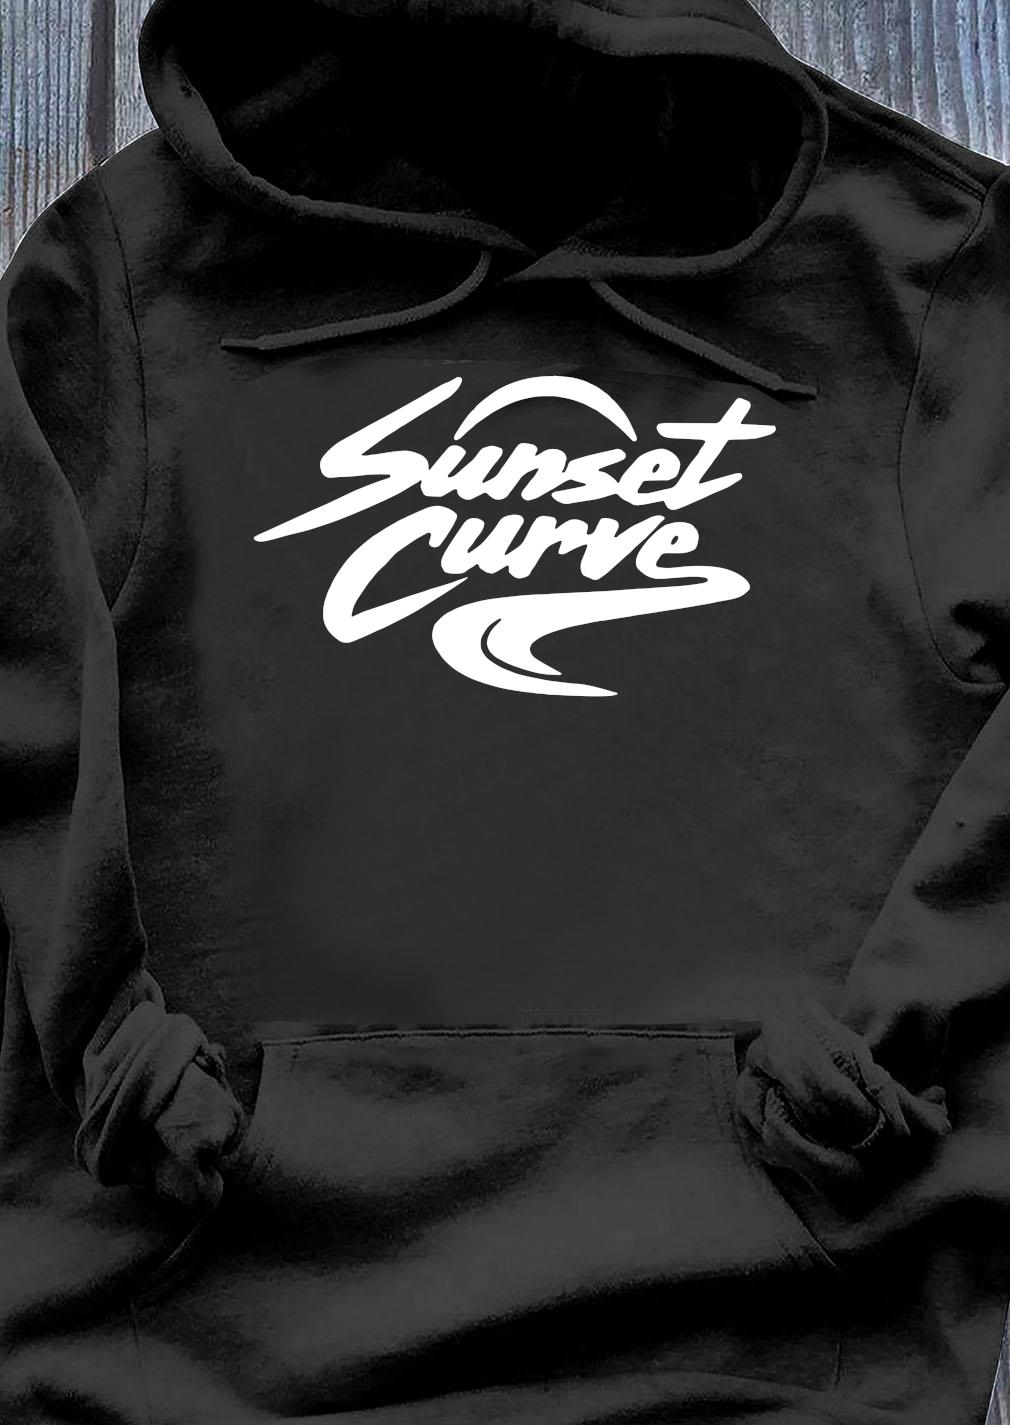 Sunset Curve Shirt Hoodie